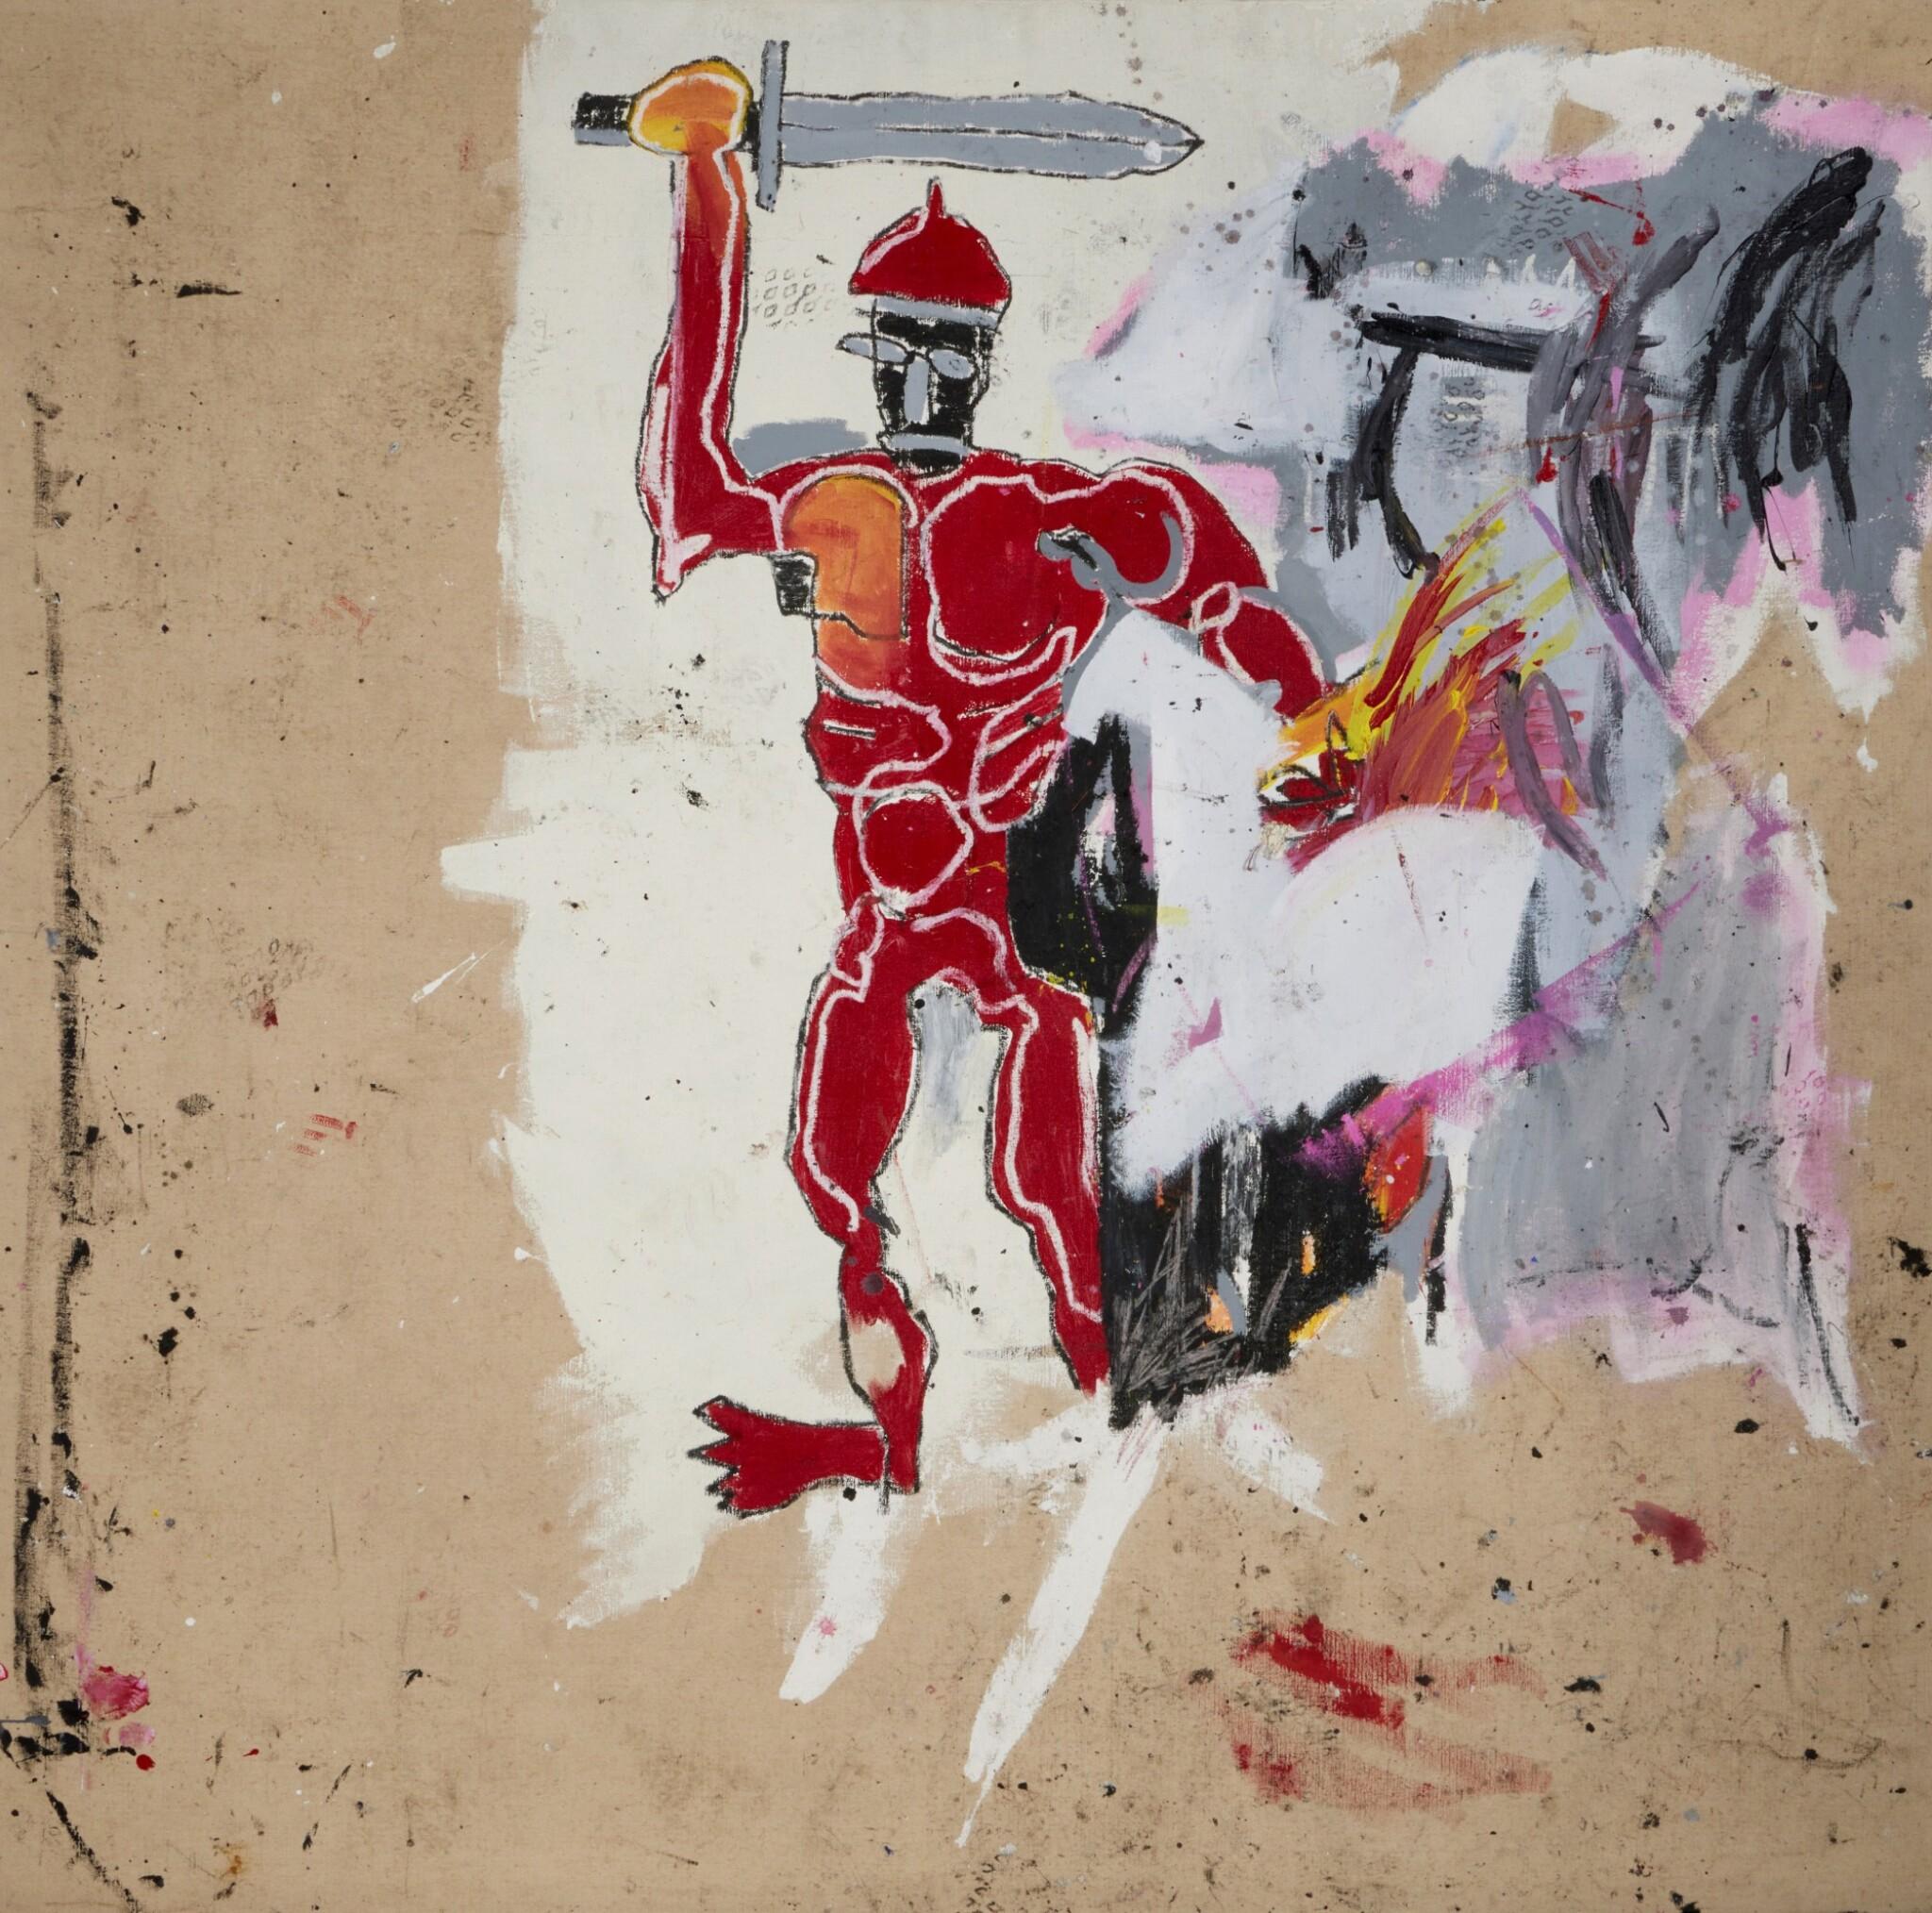 View full screen - View 1 of Lot 1118. Jean-Michel Basquiat 尚・米榭・巴斯基亞   Untitled (Red Warrior) 無題(紅戰士)     .